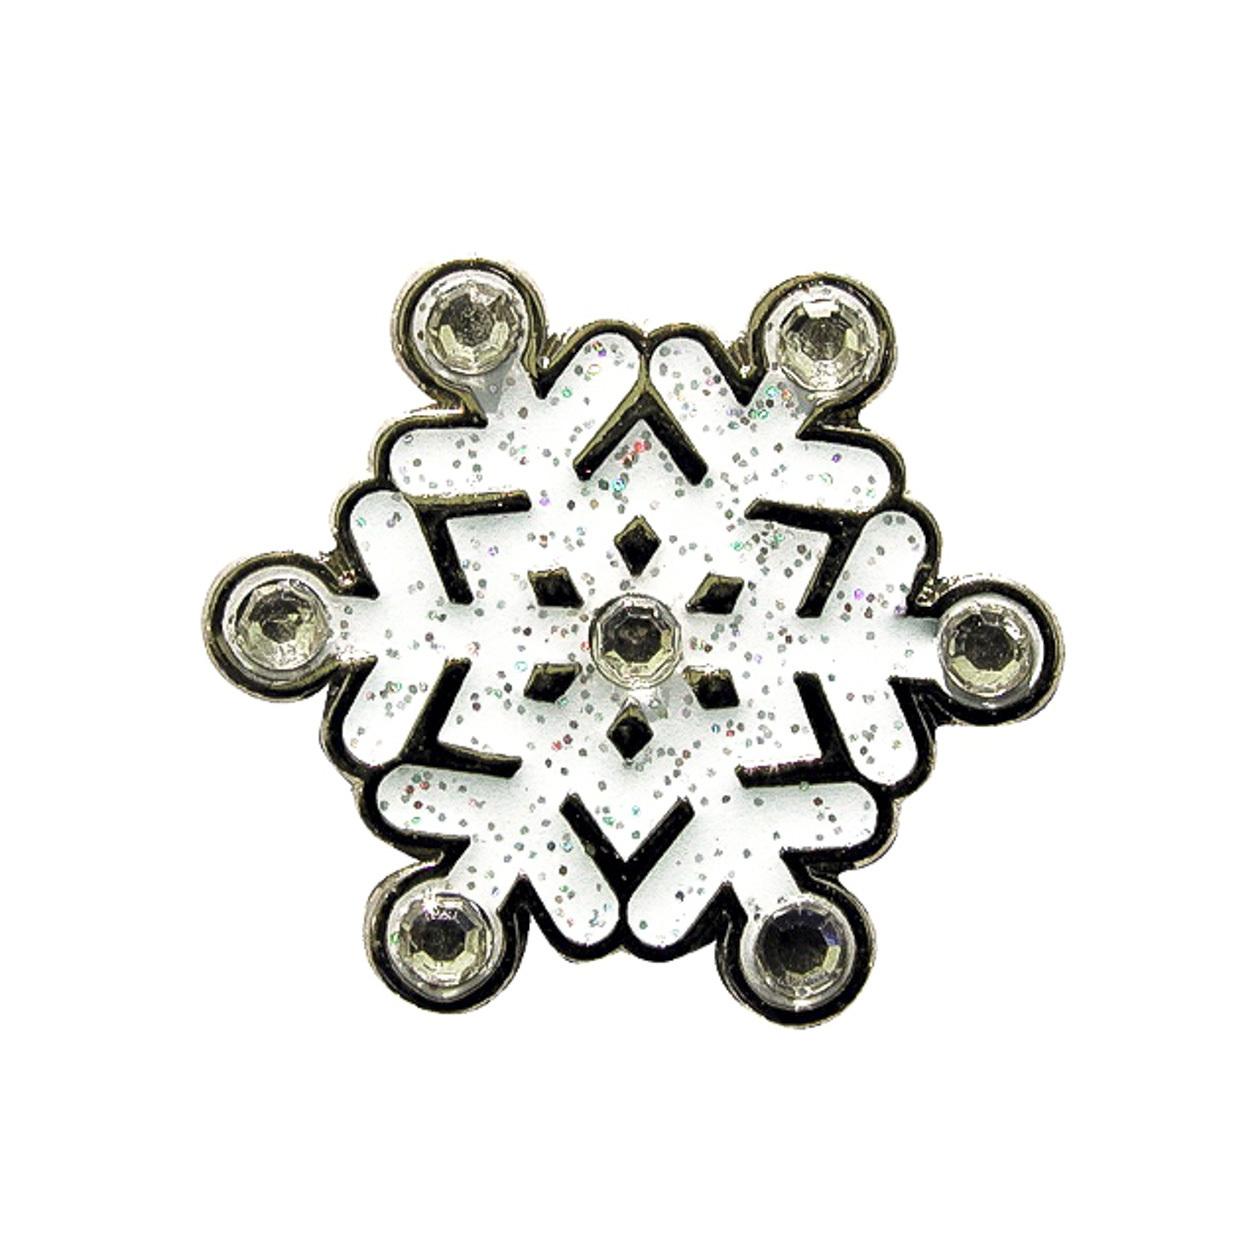 225. Snowflake